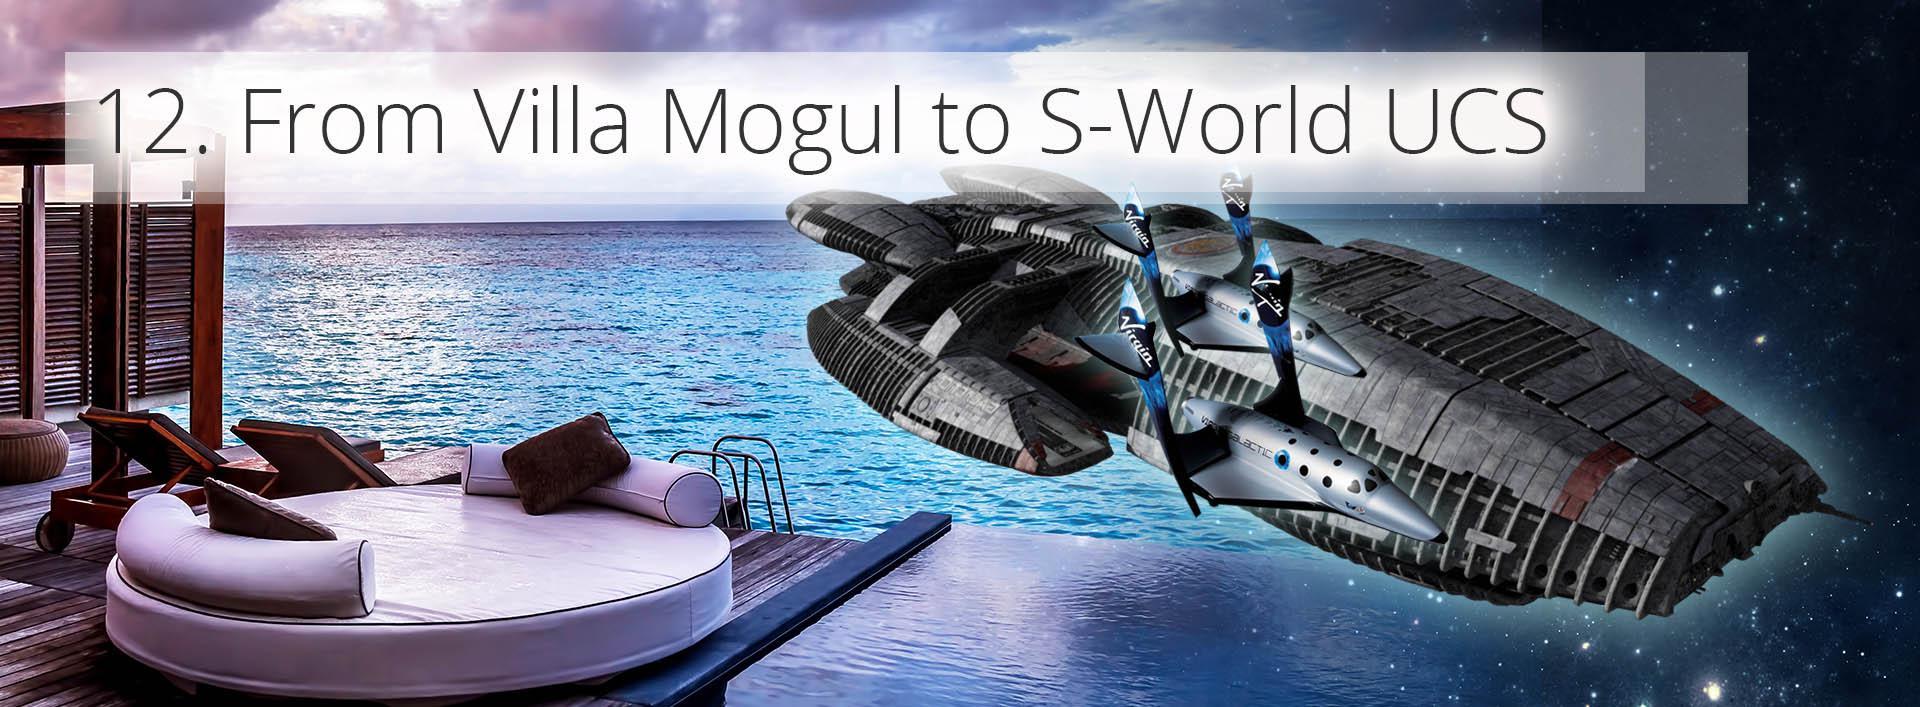 From Villa Mogul to S-Worls UCS